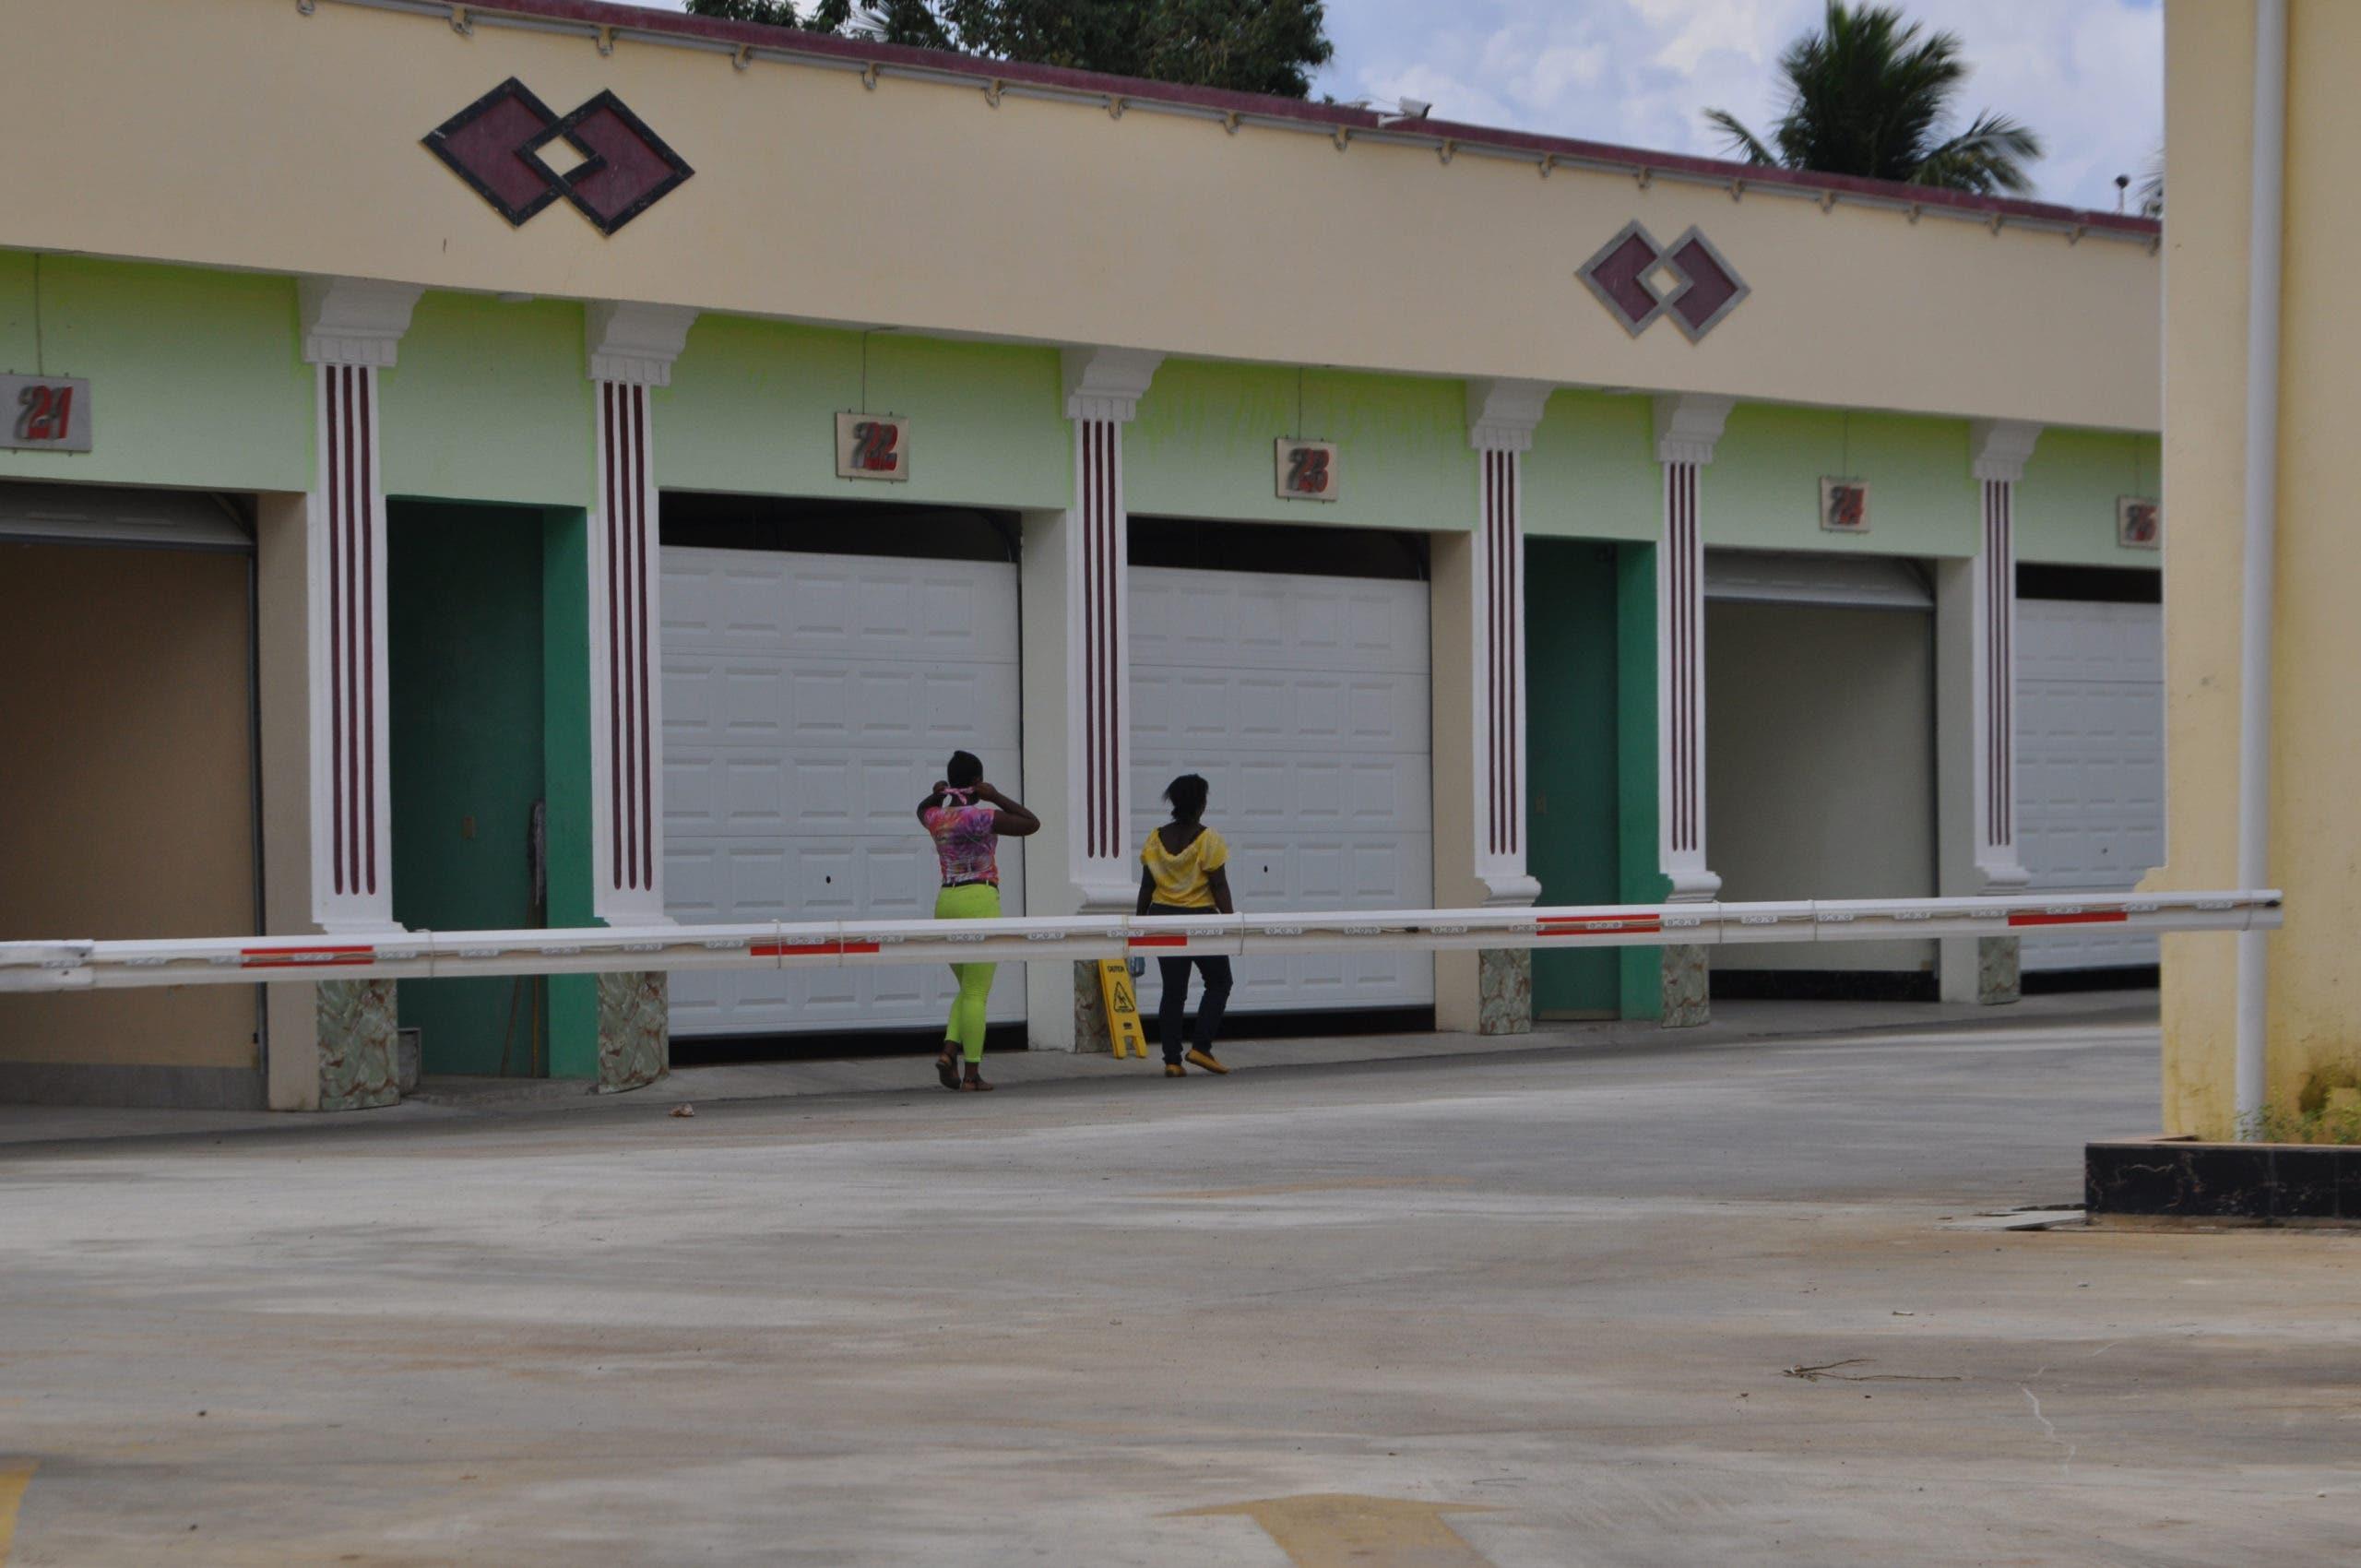 Cabañas y moteles ya abrieron; se suman a reapertura